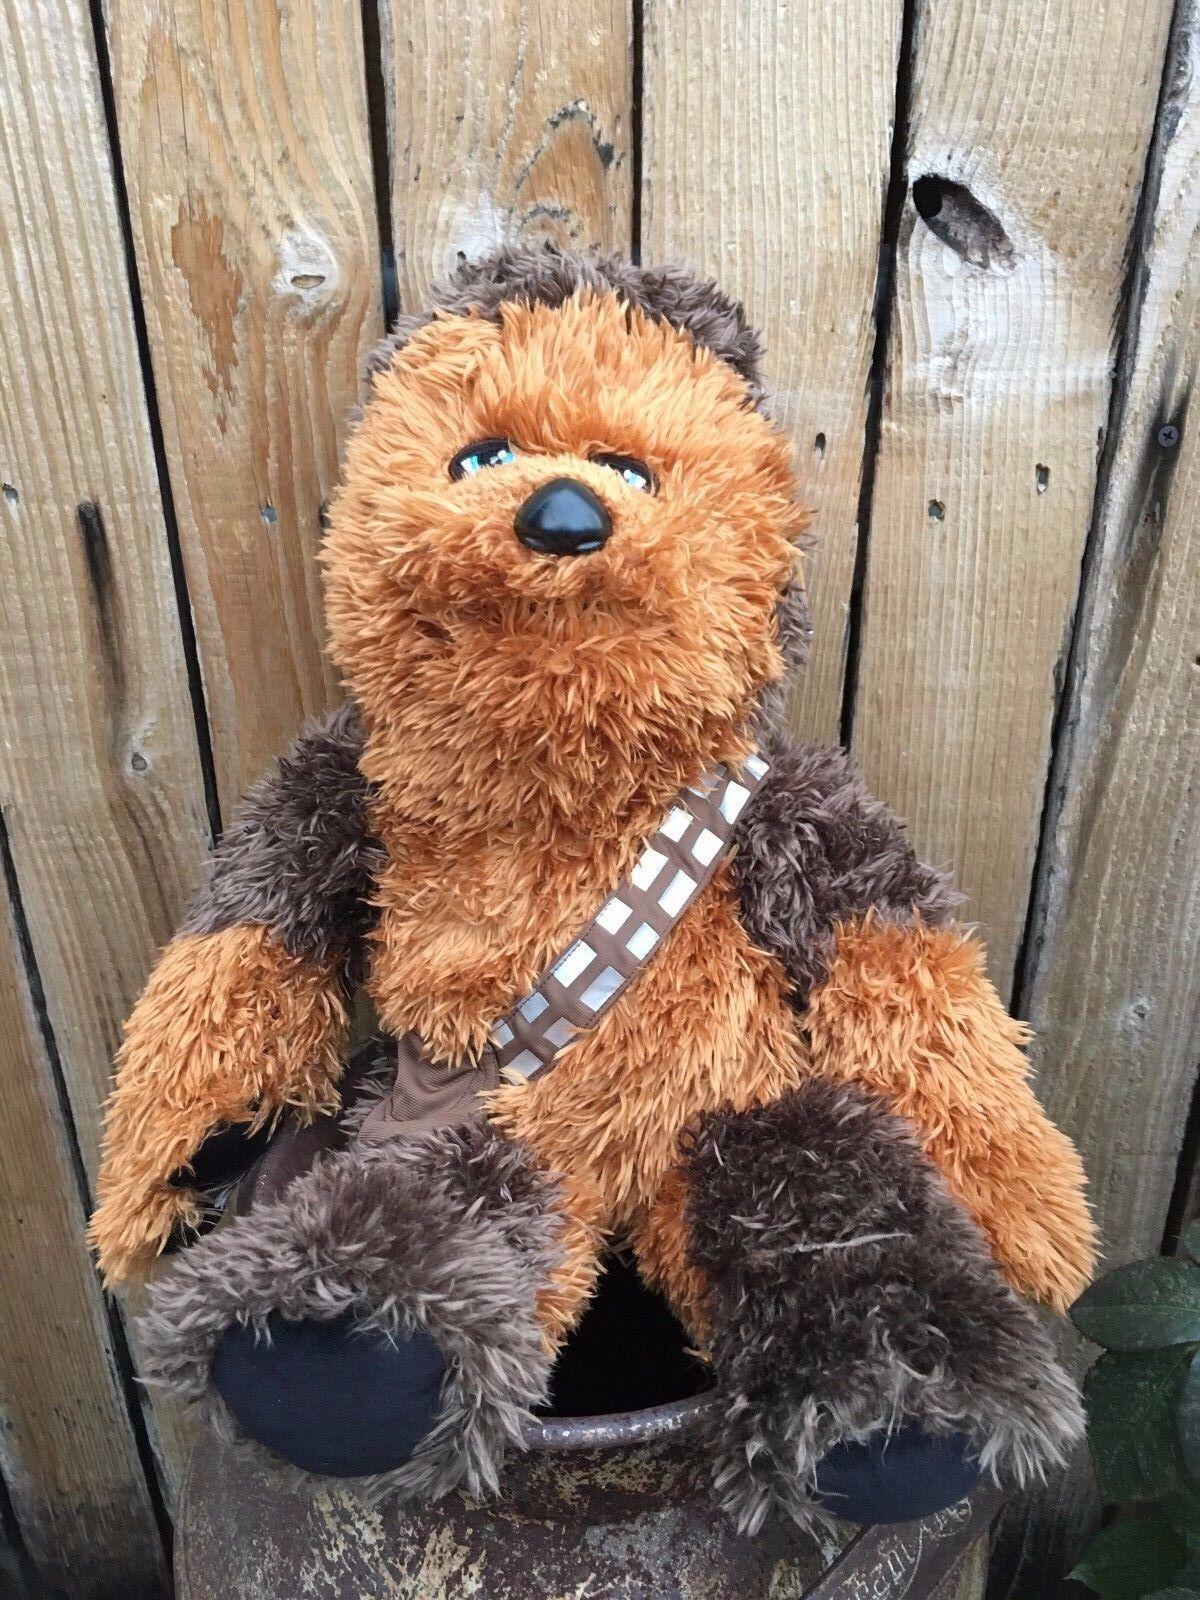 Build A Bear 18 In. Star Wars Chewbacca Bär Plüsch Ungefüllt Neu